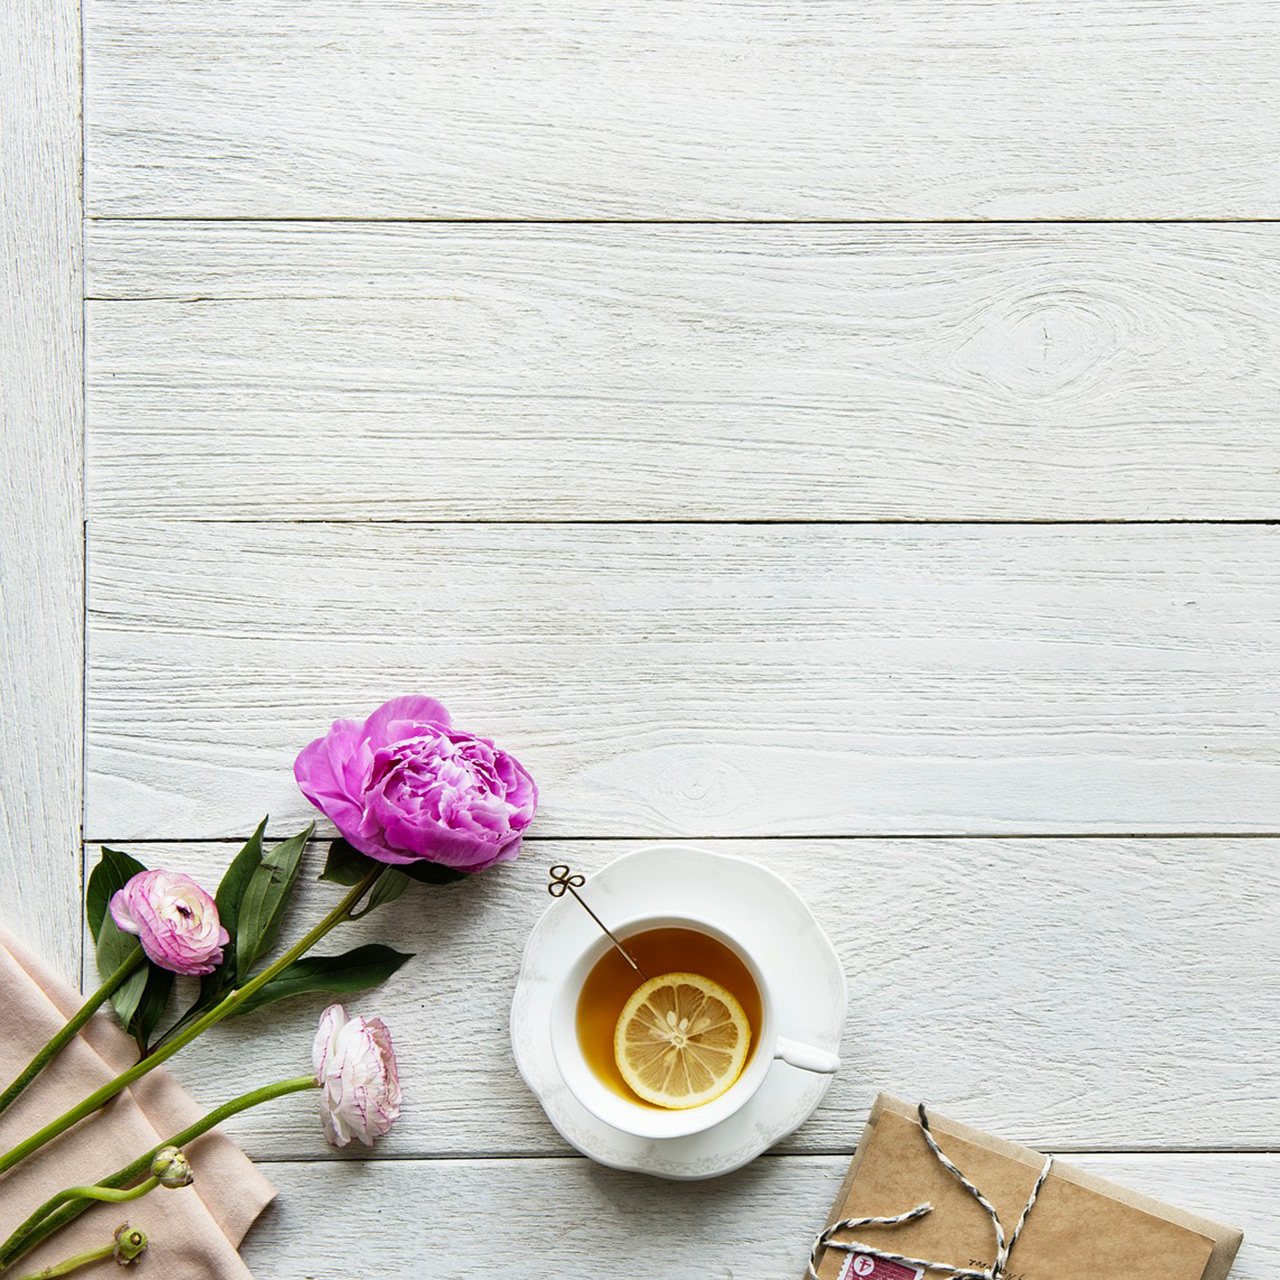 bureau avec roses